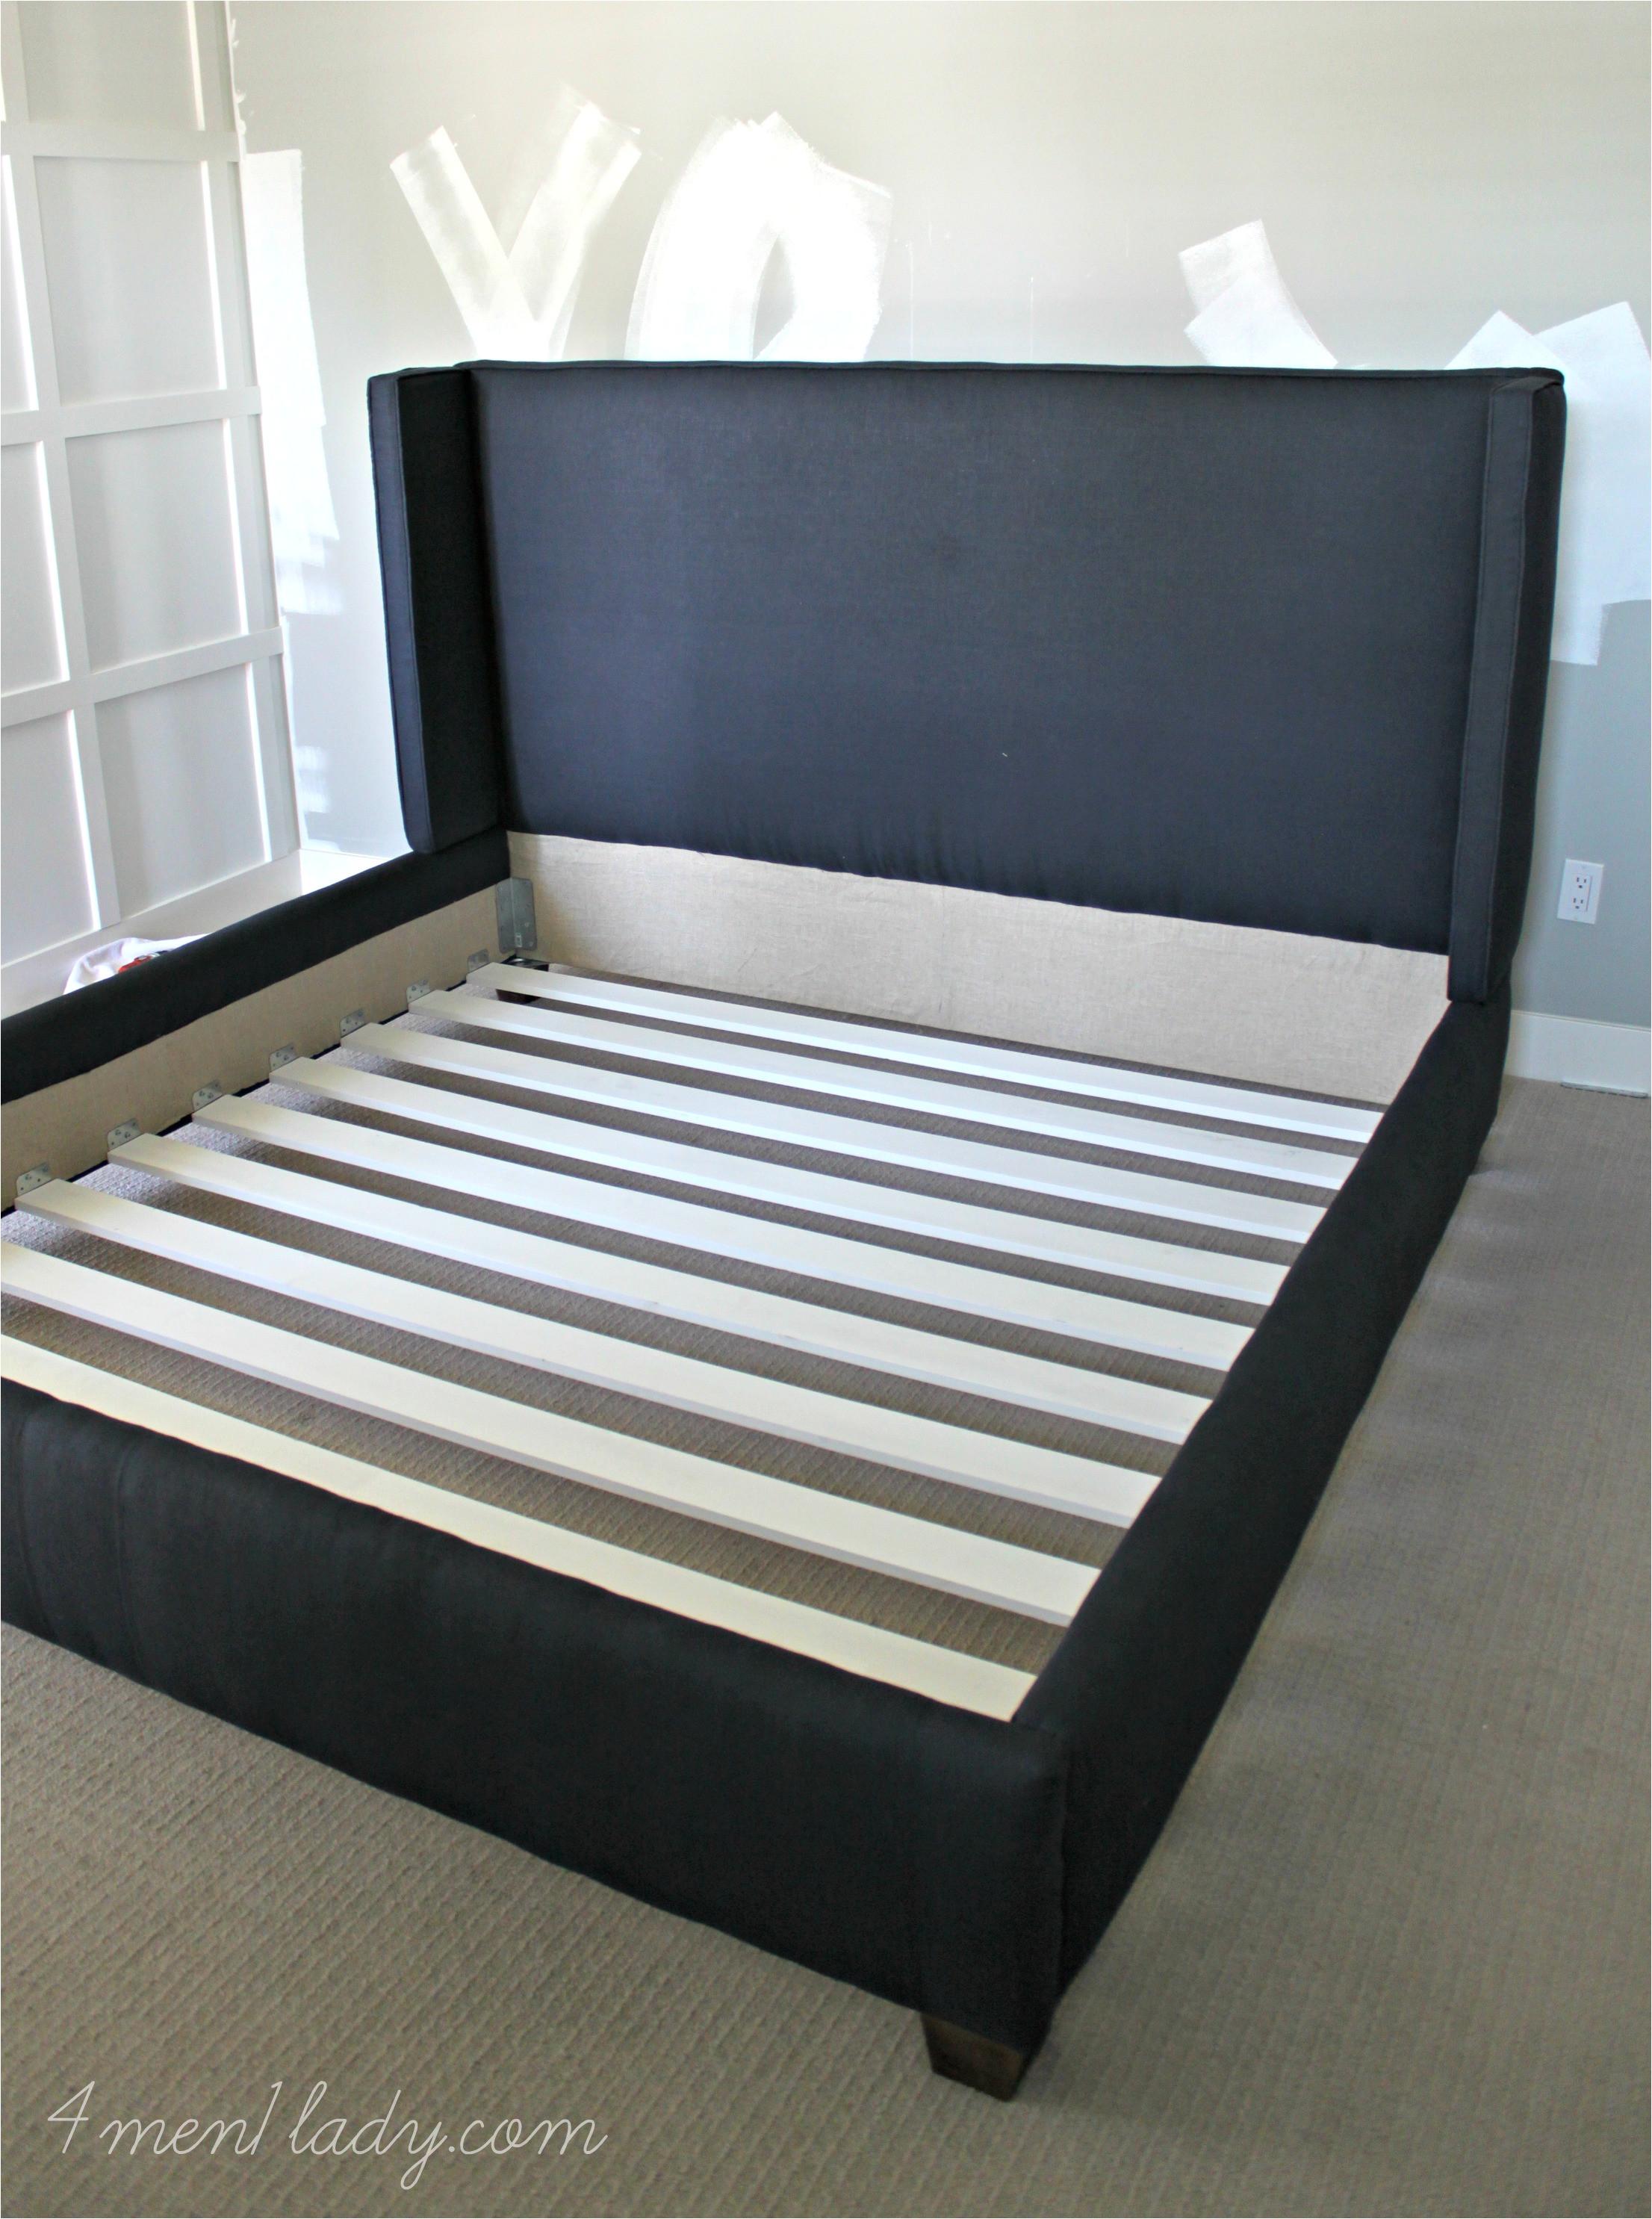 amazing home depot bed frame home depot big ikea king size bed frame jpg 2212x2971 home